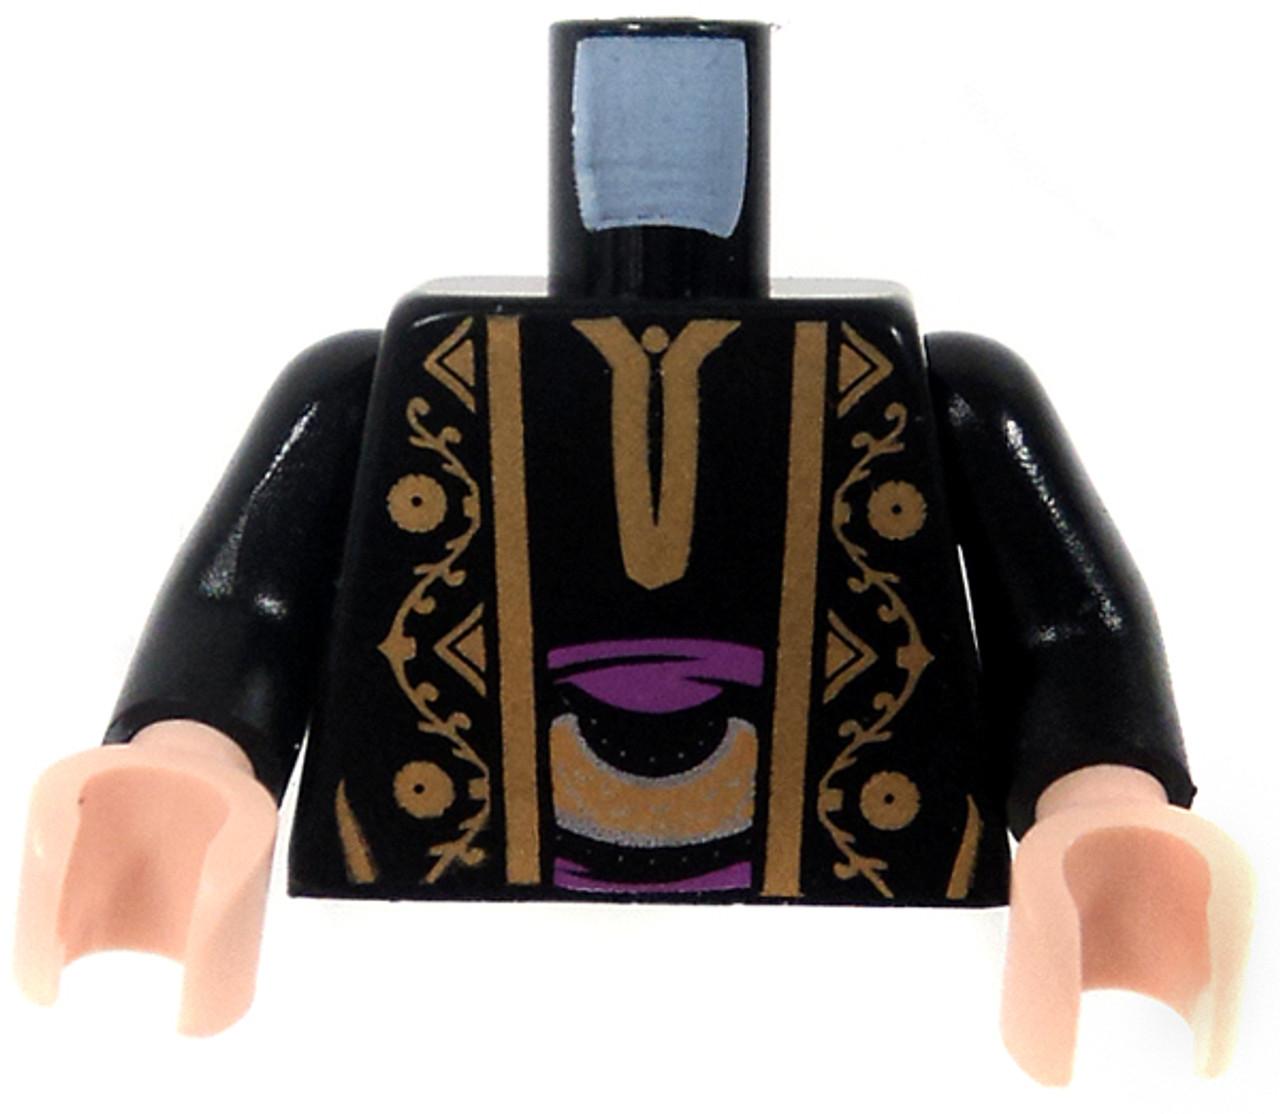 LEGO-MINIFIGURES SERIES x 1 BLACK UMBRELLA FOR MINIFIGURES PARTS